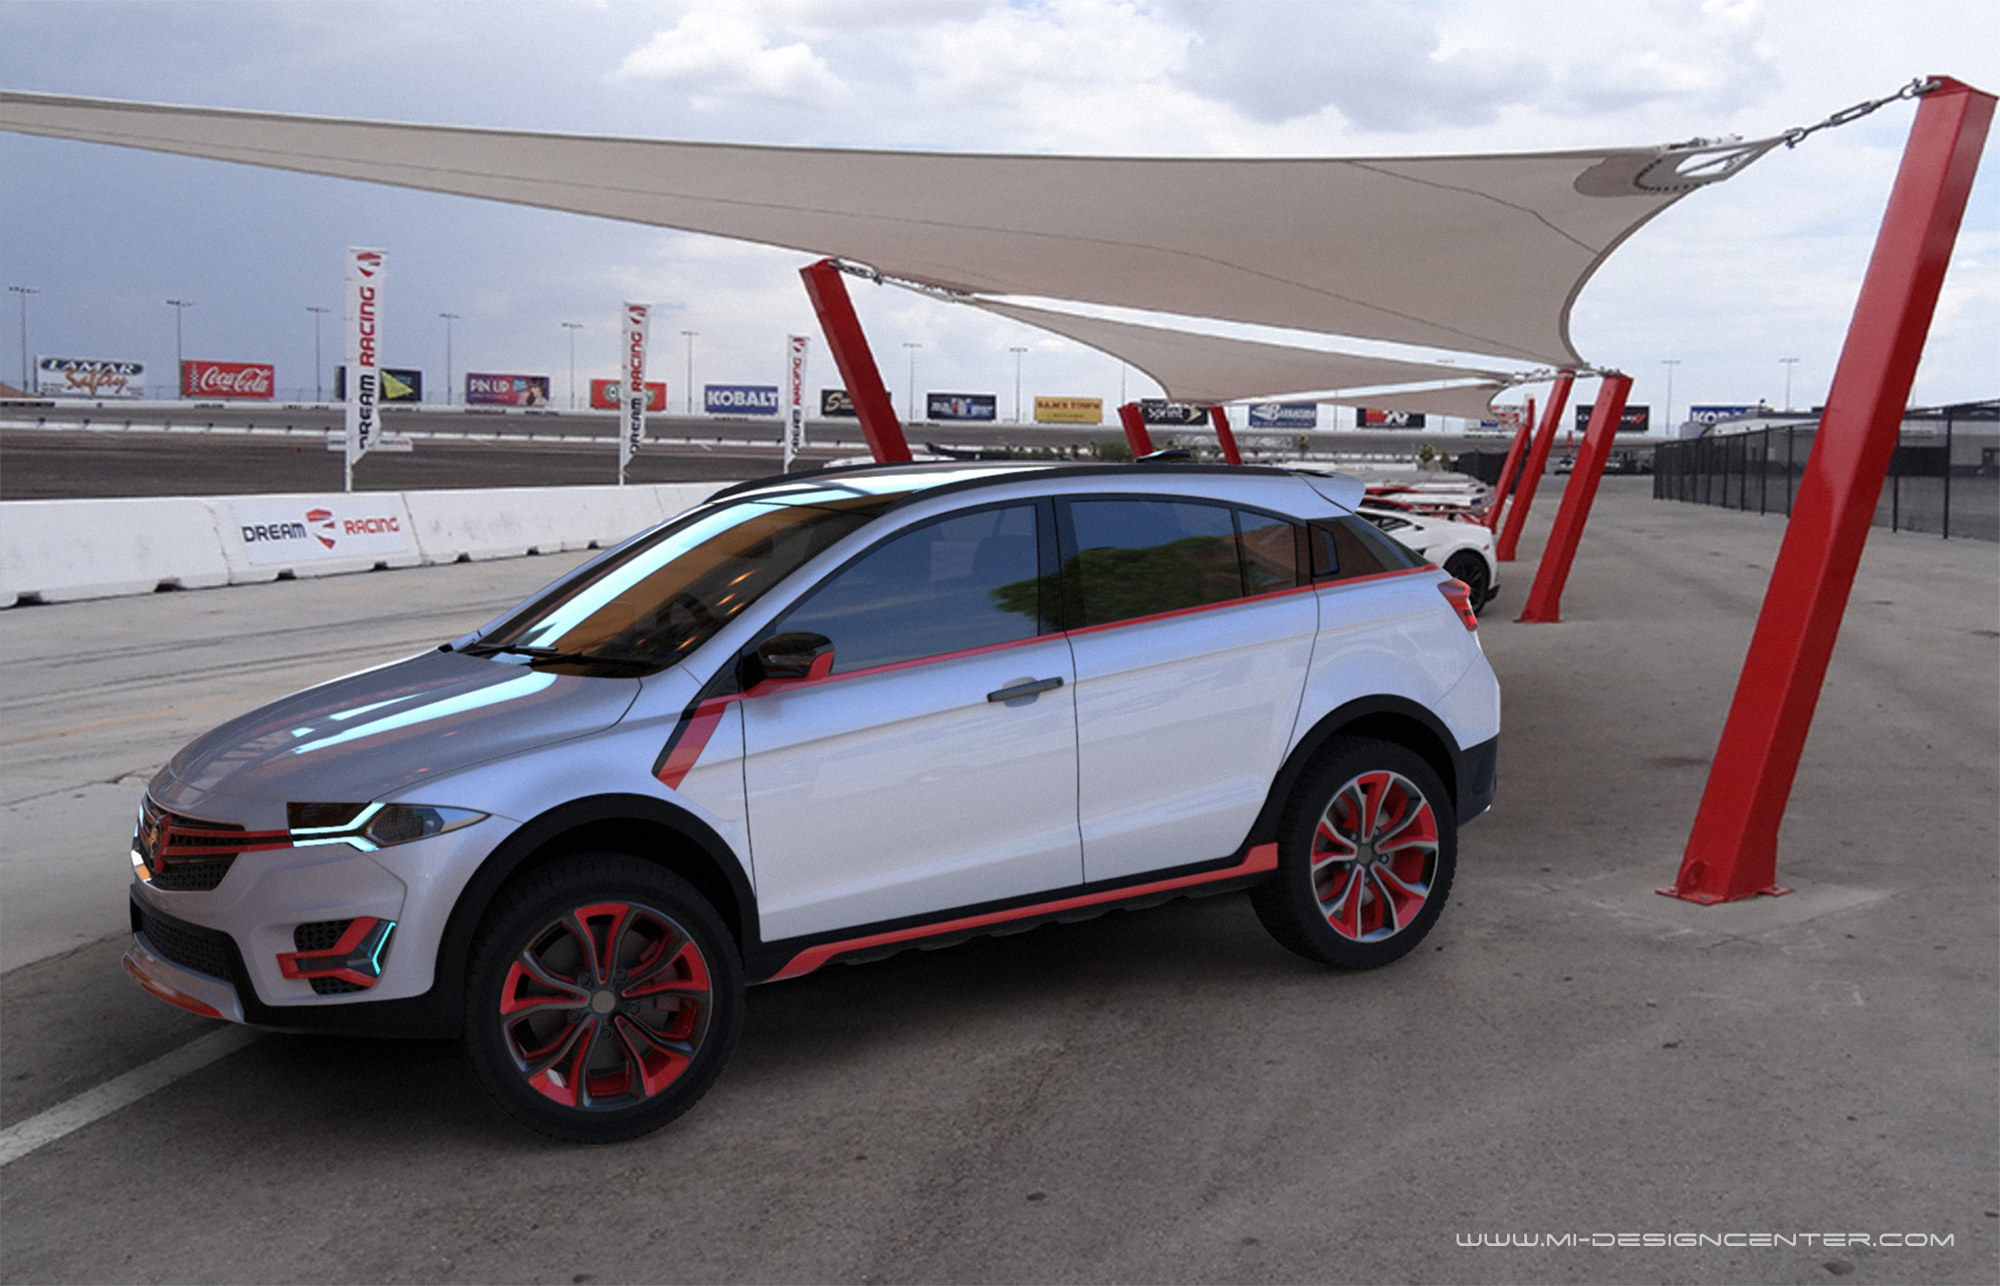 肌肉型SUV,Proton Suprima X 完整设计图及视频曝光! 1_2017_Suprima_X ...